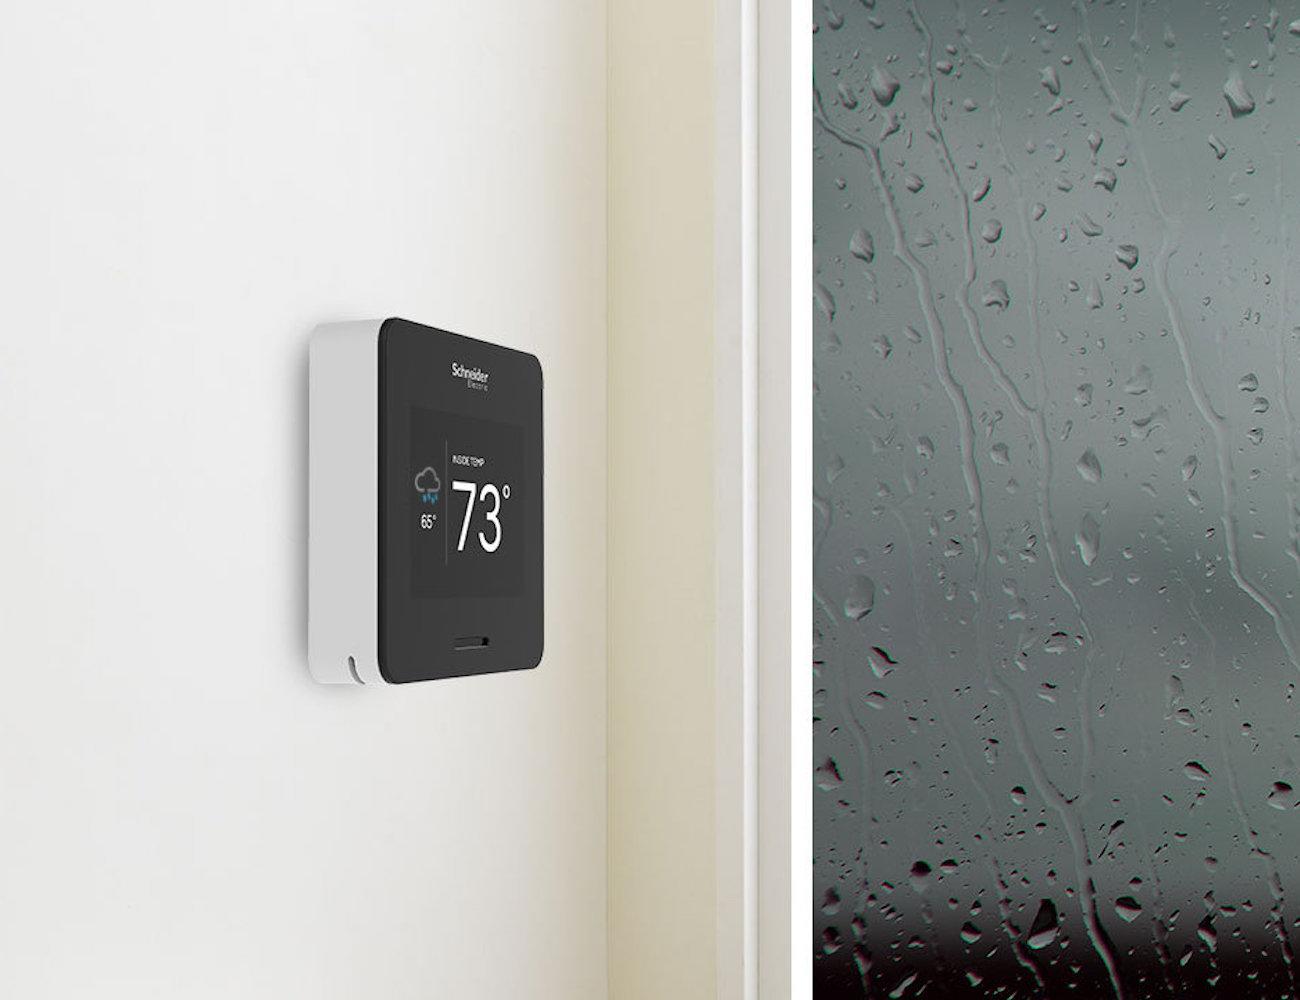 wiser-air-smart-thermostat-by-schneider-electric-03